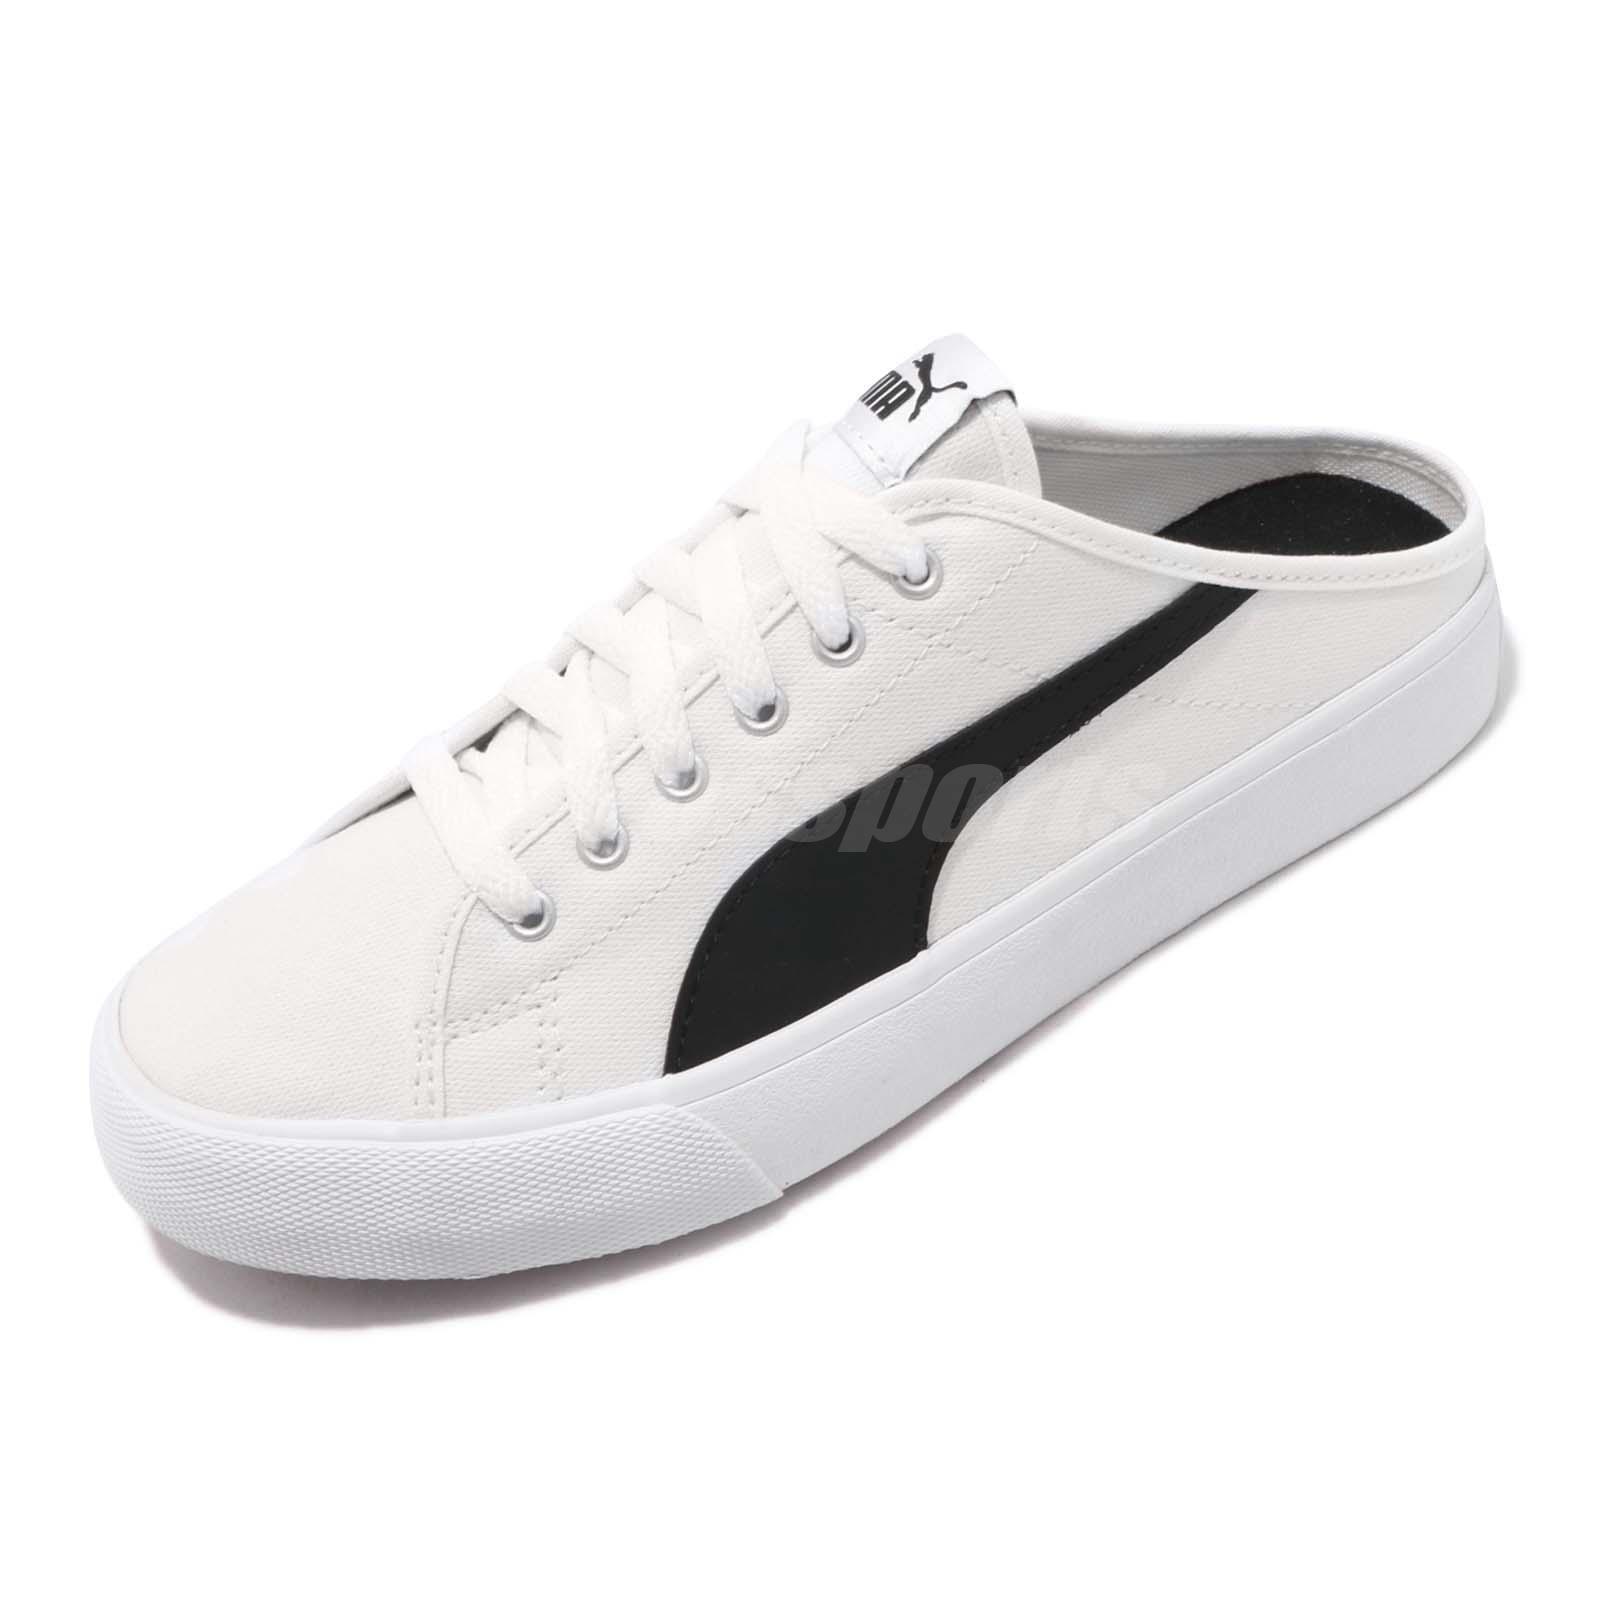 f8a6c9bd90 Puma Bari Mule White Black Mens Womens Casual Shoes Slip-On 37131802 ...